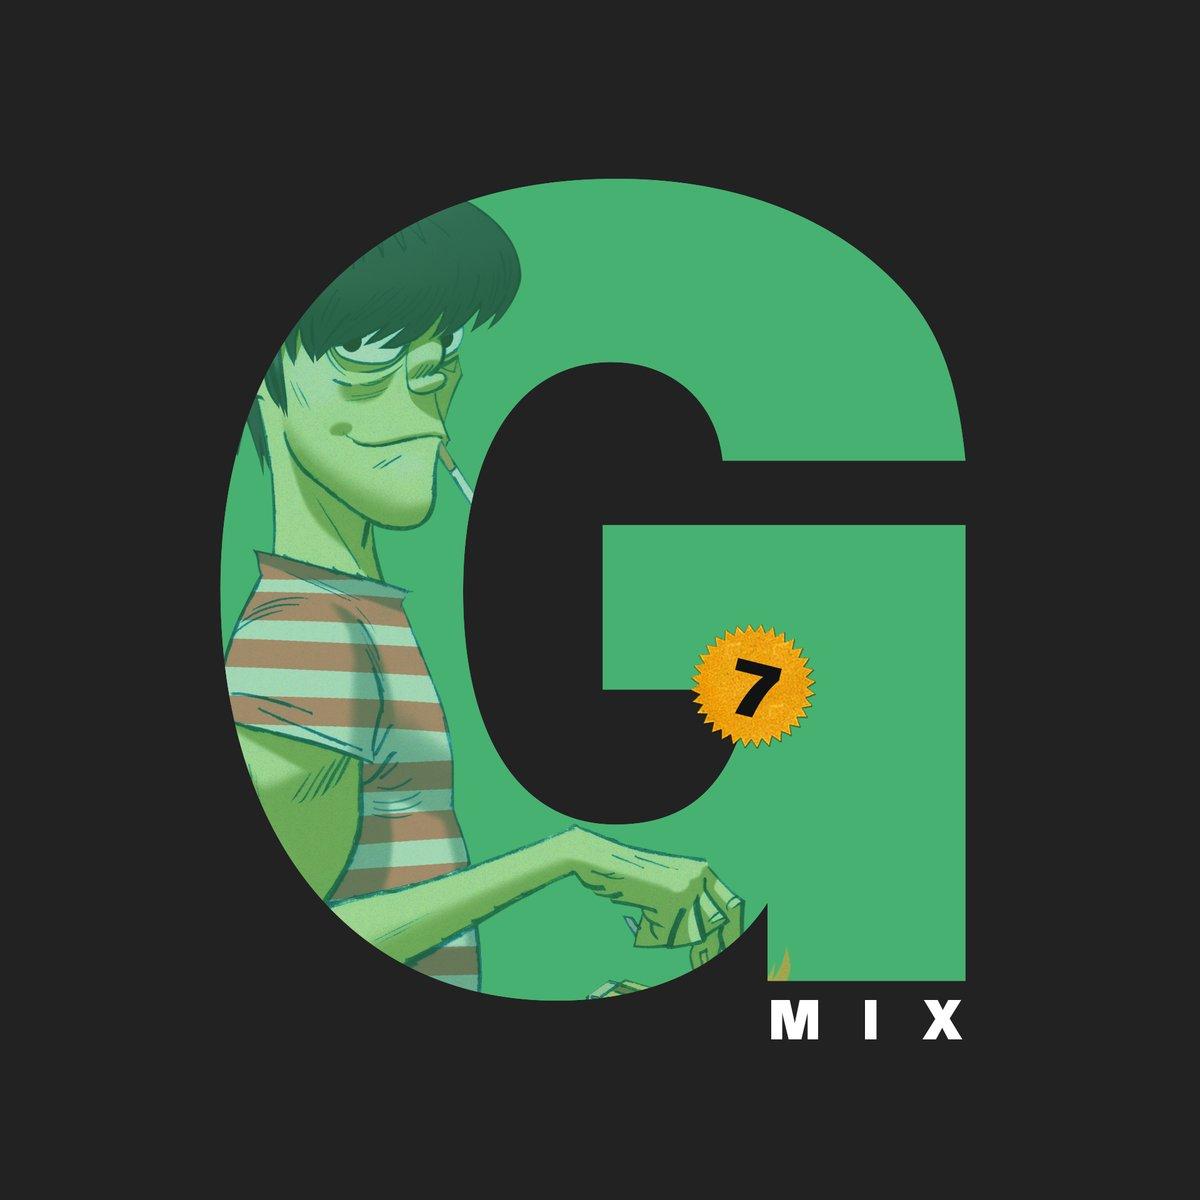 G-Mix: Murdoc 7